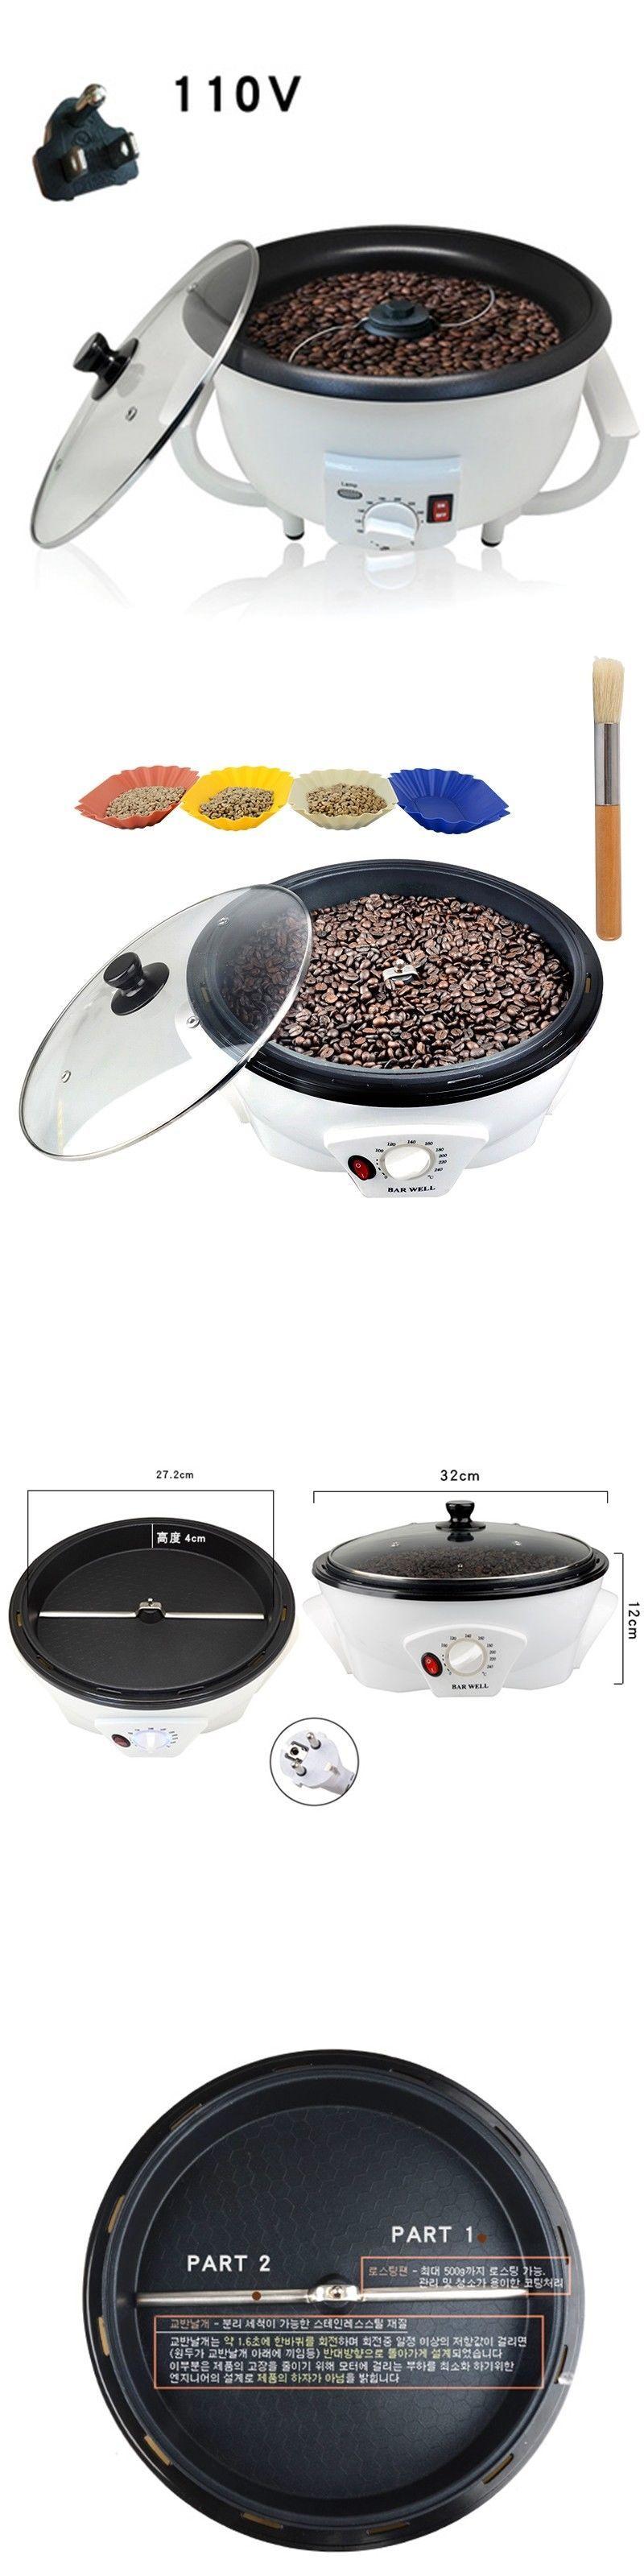 Coffee Roasters 177753 110V Electric Coffee Roaster